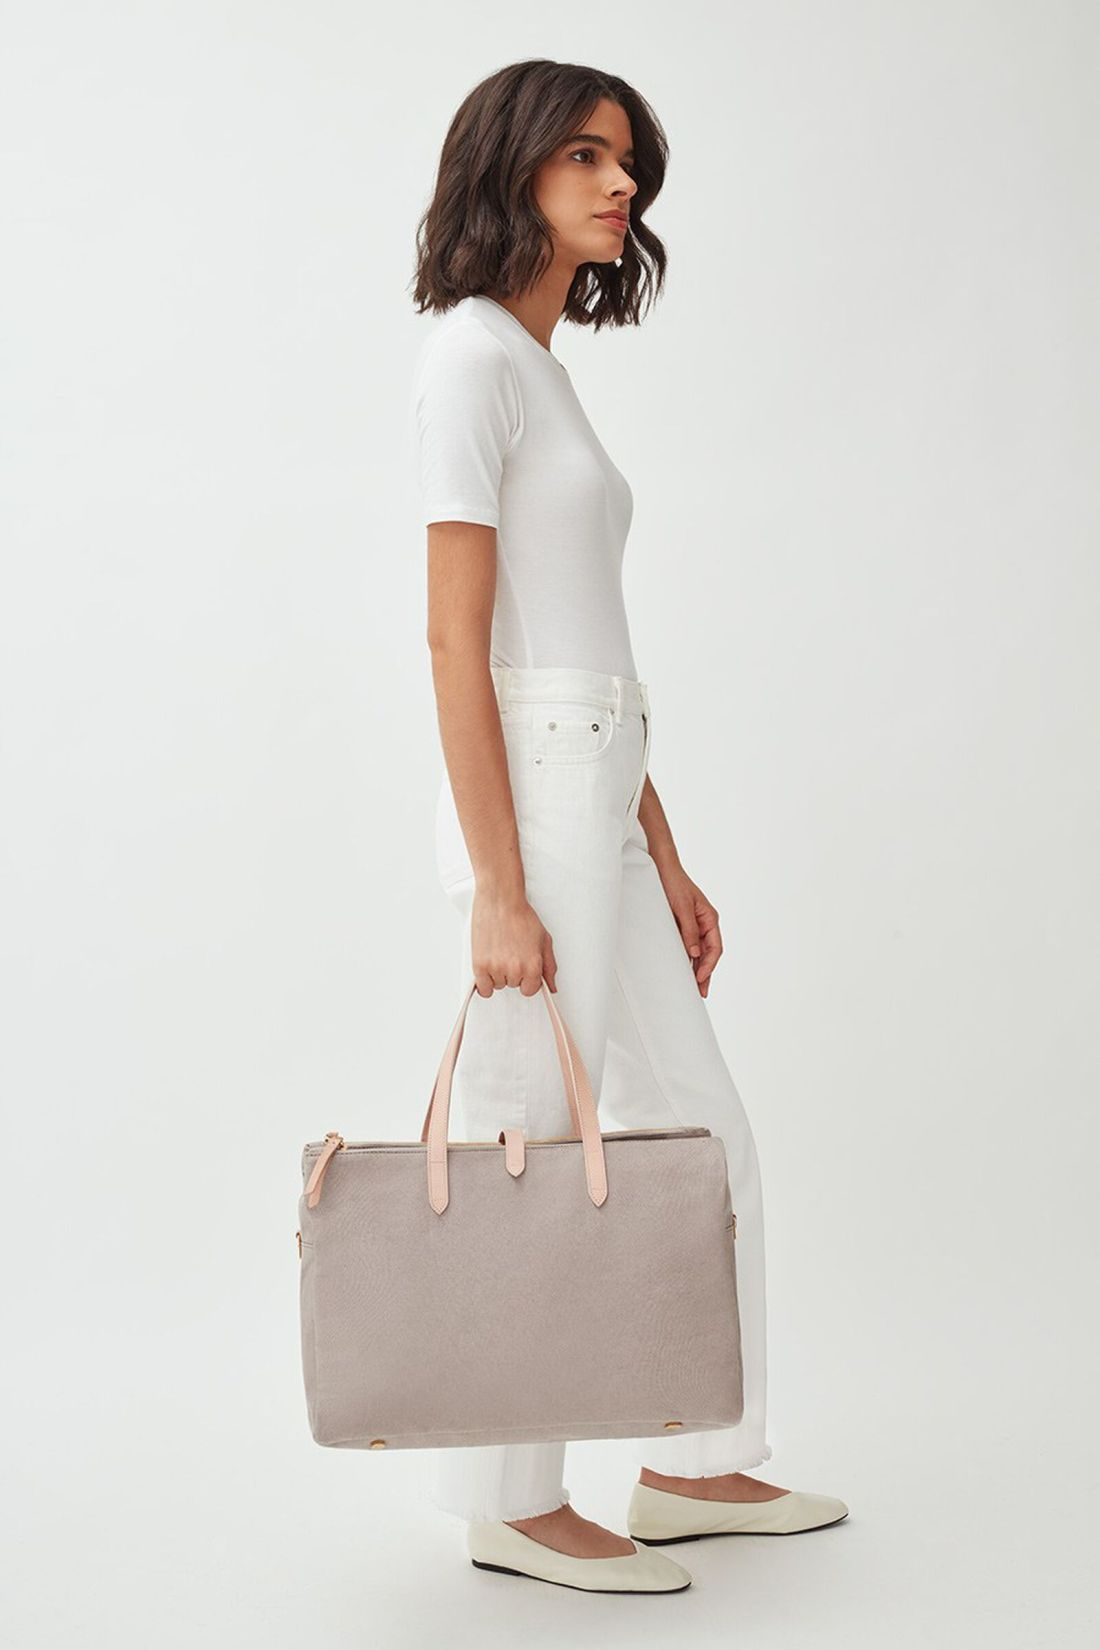 Modeling carrying Cuyana Triple Zipper Weekender Bag in Soft Grey Detail